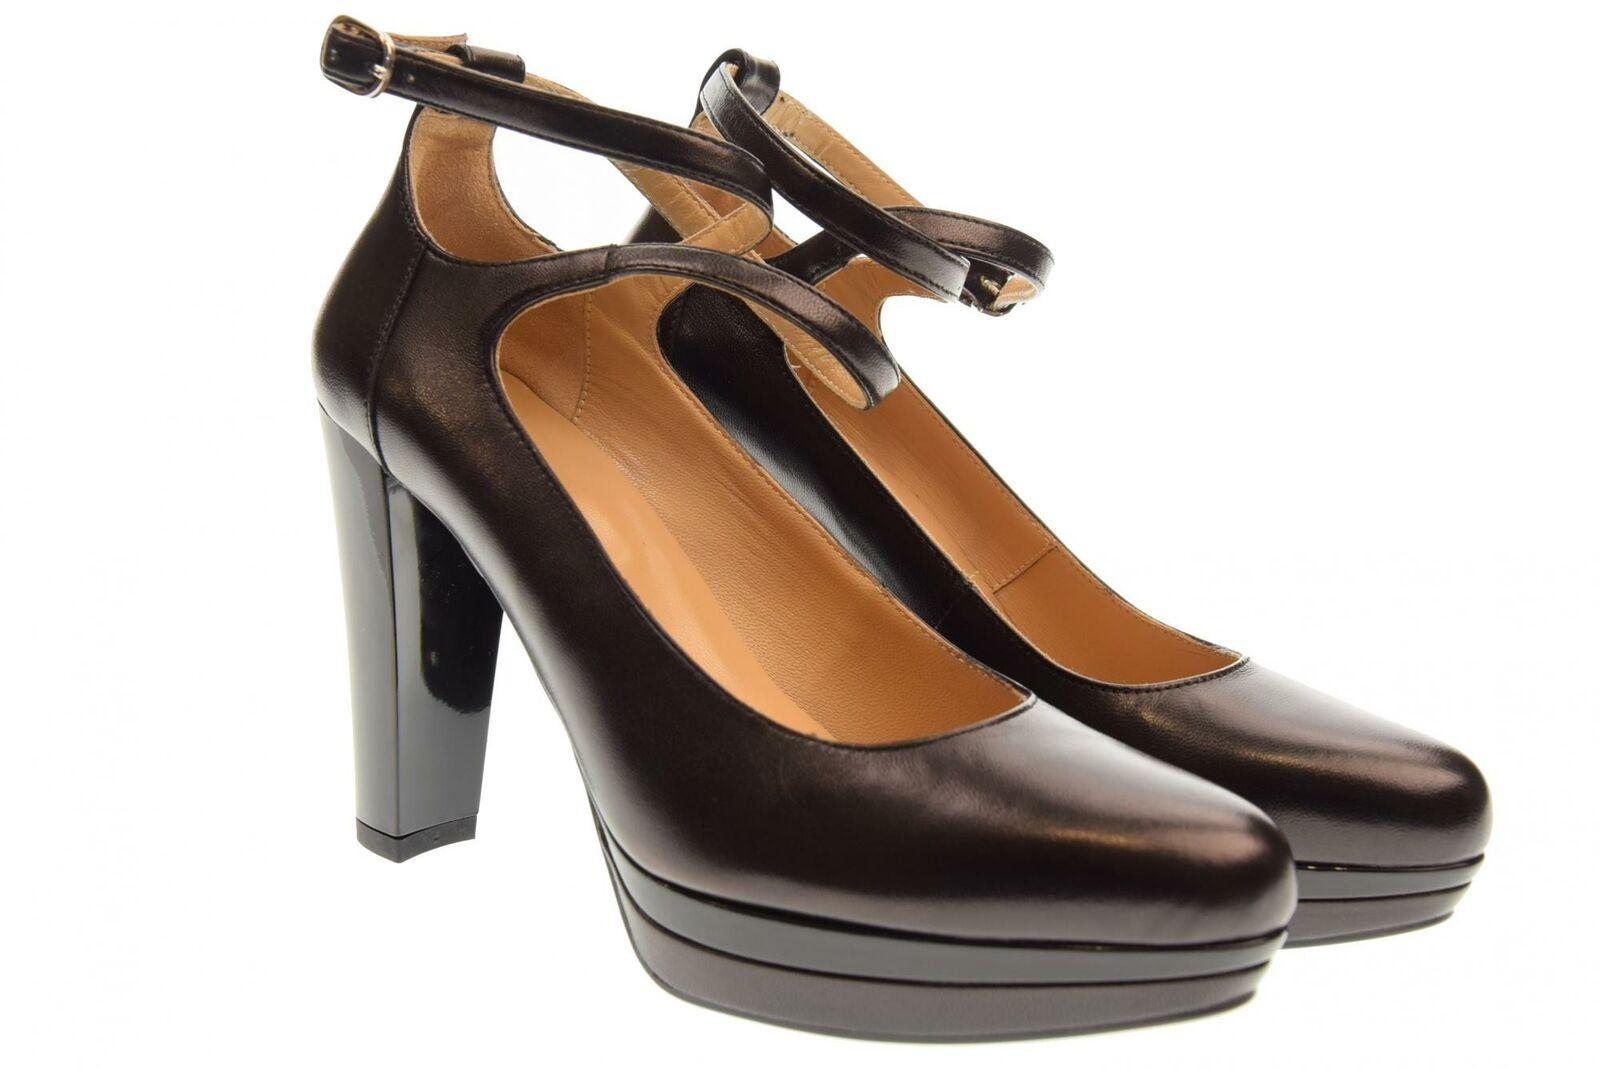 Nuova lista Nero Giardini scarpe donna decolletè decolletè decolletè con tacco  A806821DE 100 A18  100% autentico